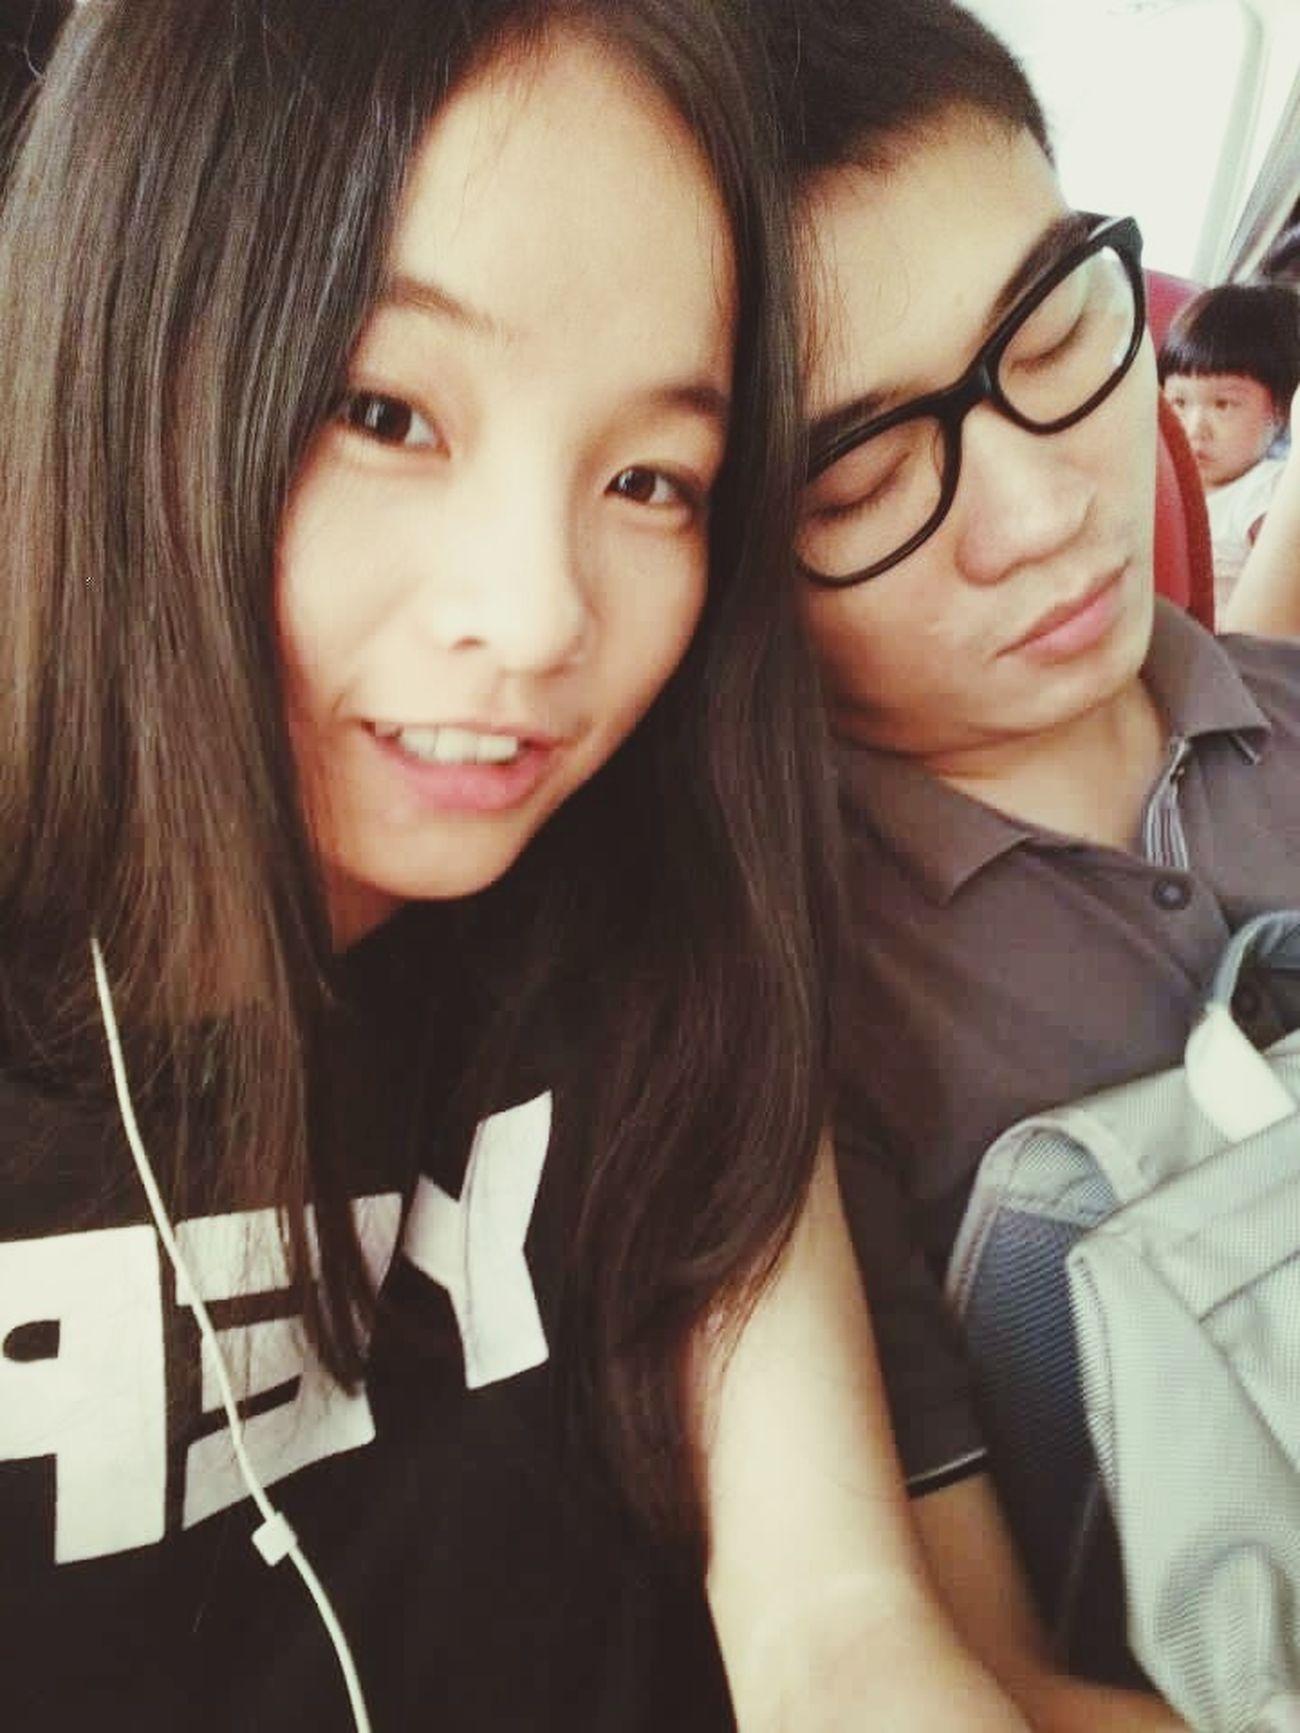 N travel with u